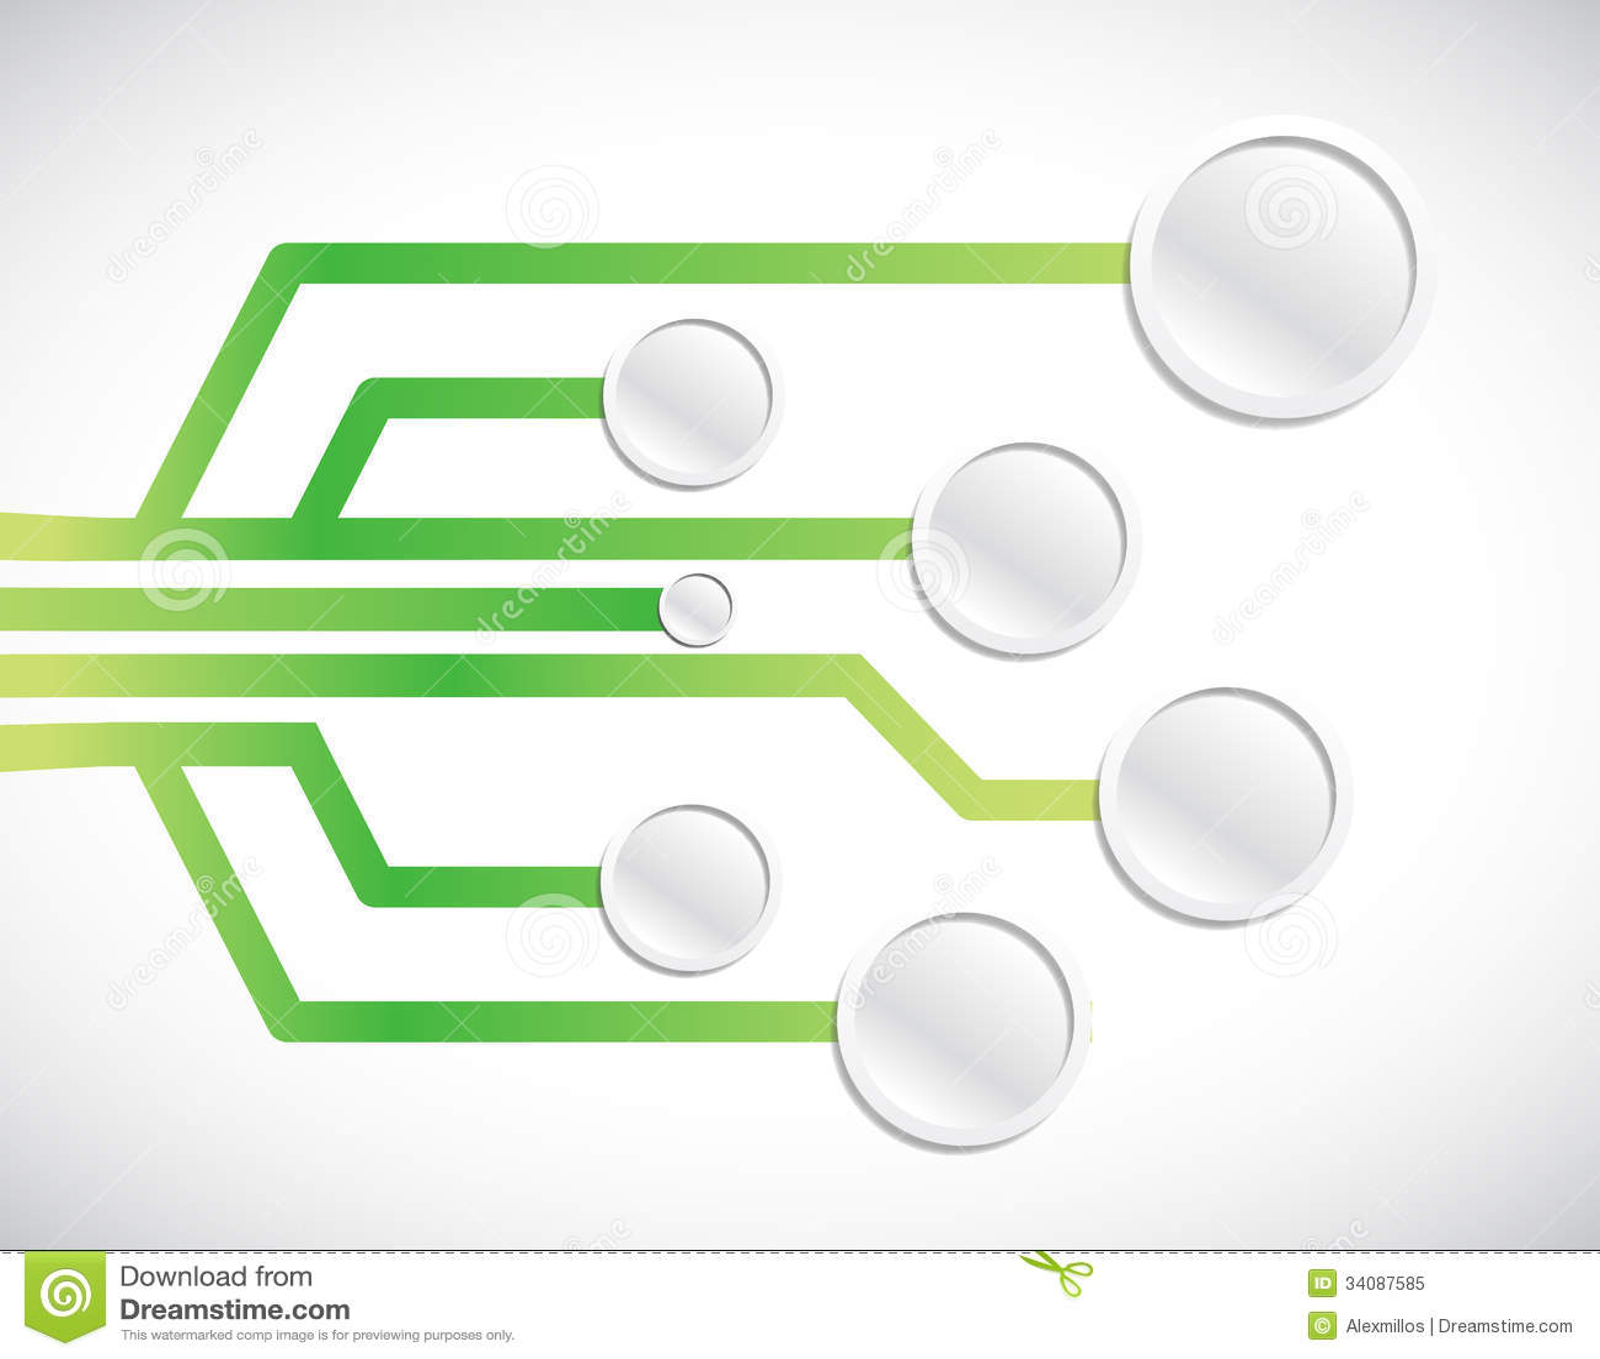 Circuit Network Diagram Illustration Design Stock Image - Image of ...